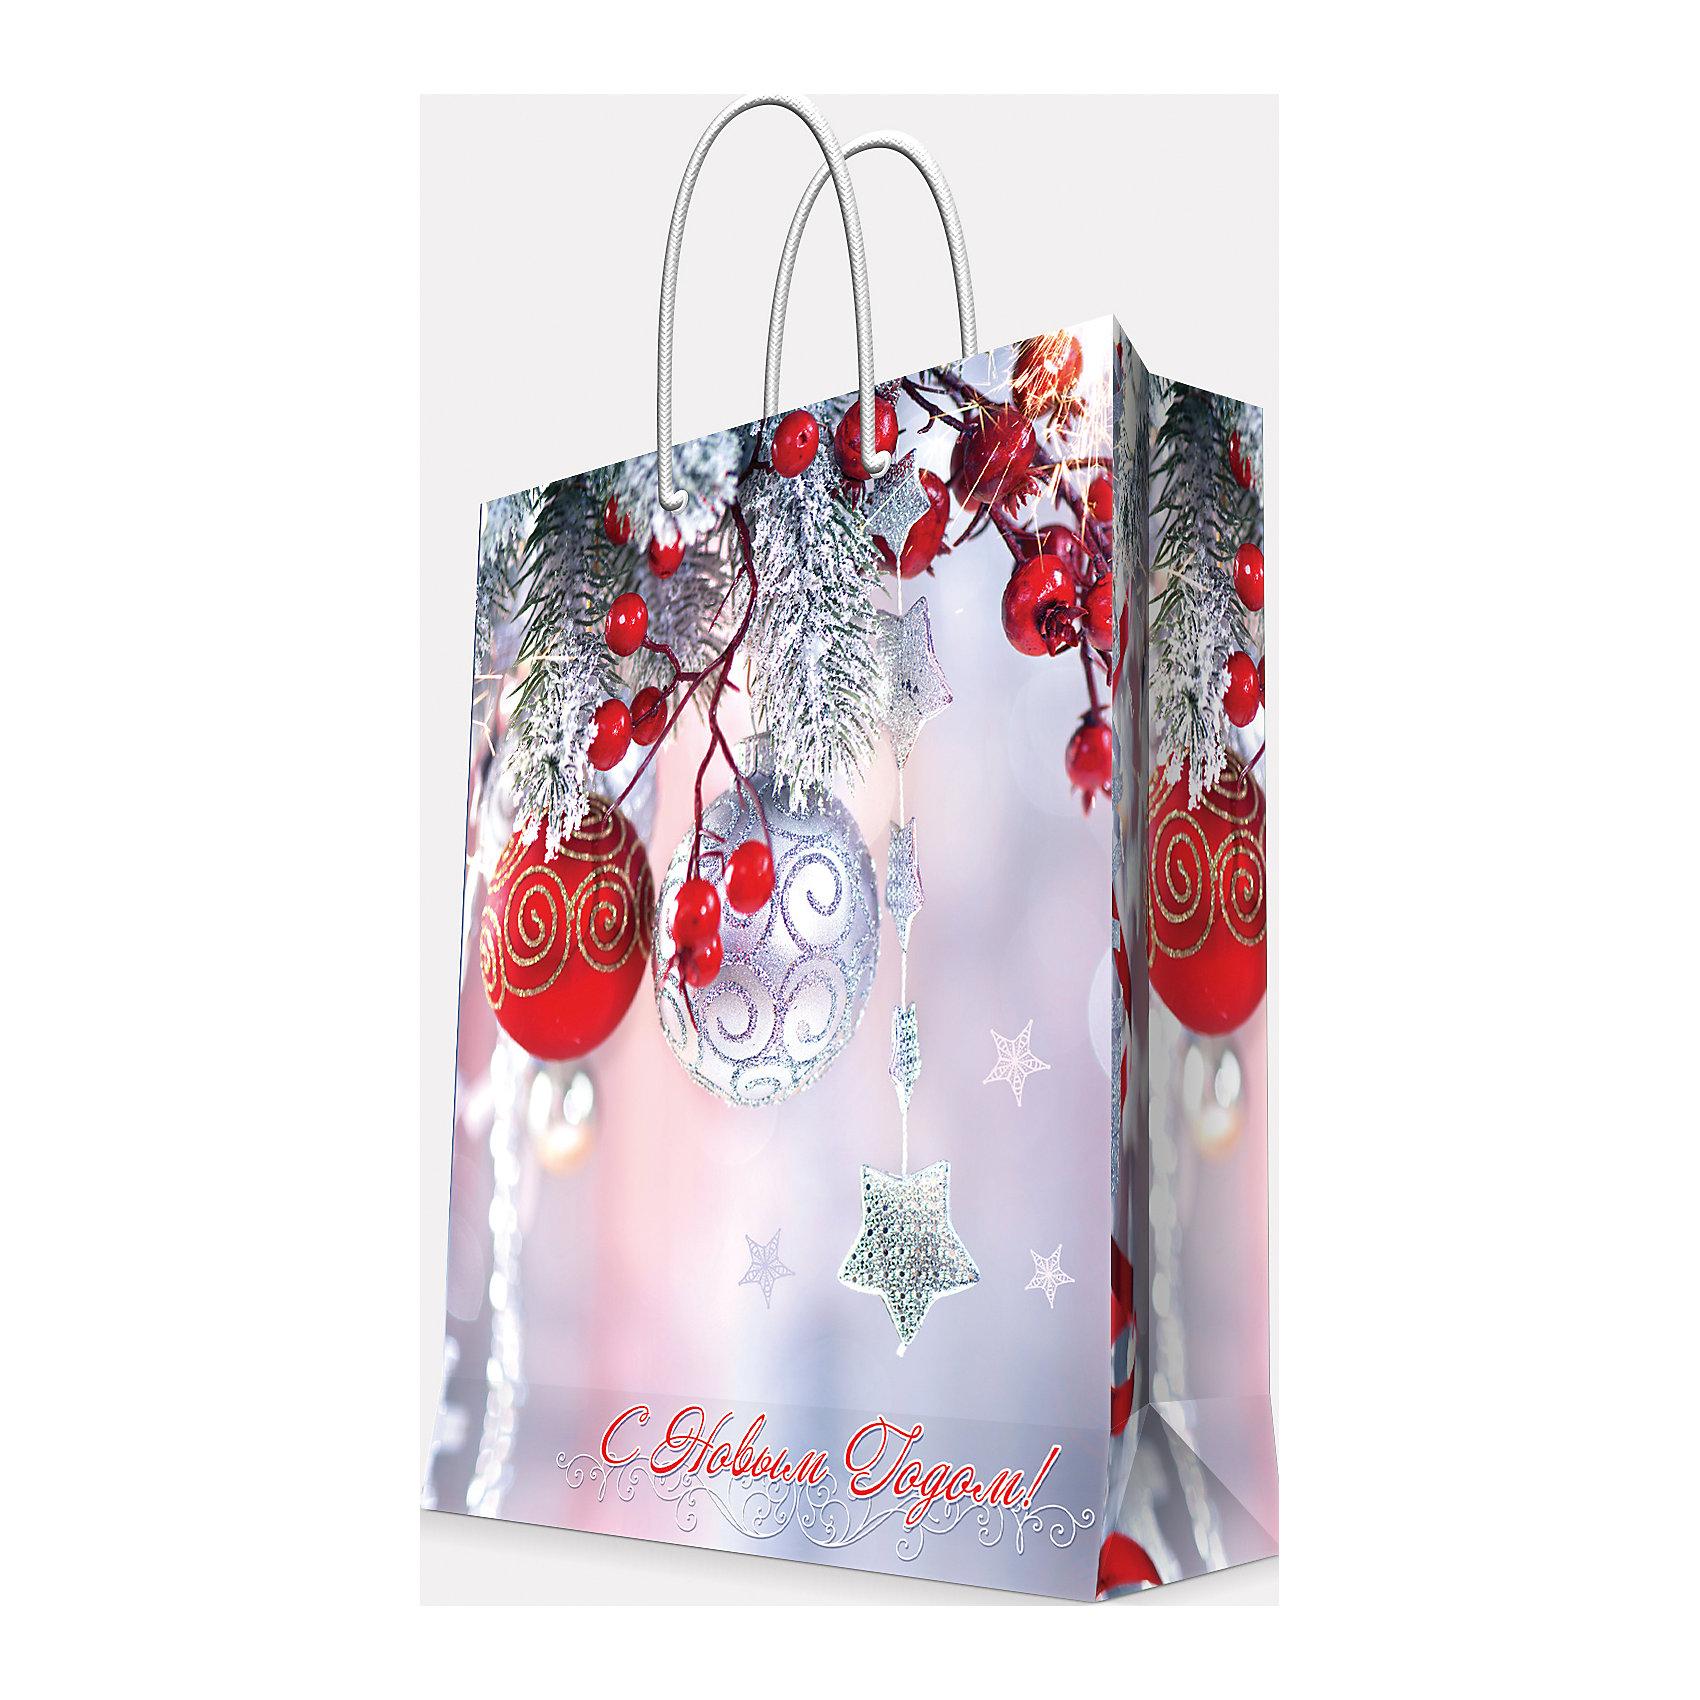 Magic Time Подарочный пакет Шарики и звездочка 17,8*22,9*9,8 см magic time подарочный пакет новогодняя лампа 26 32 4 12 7 см